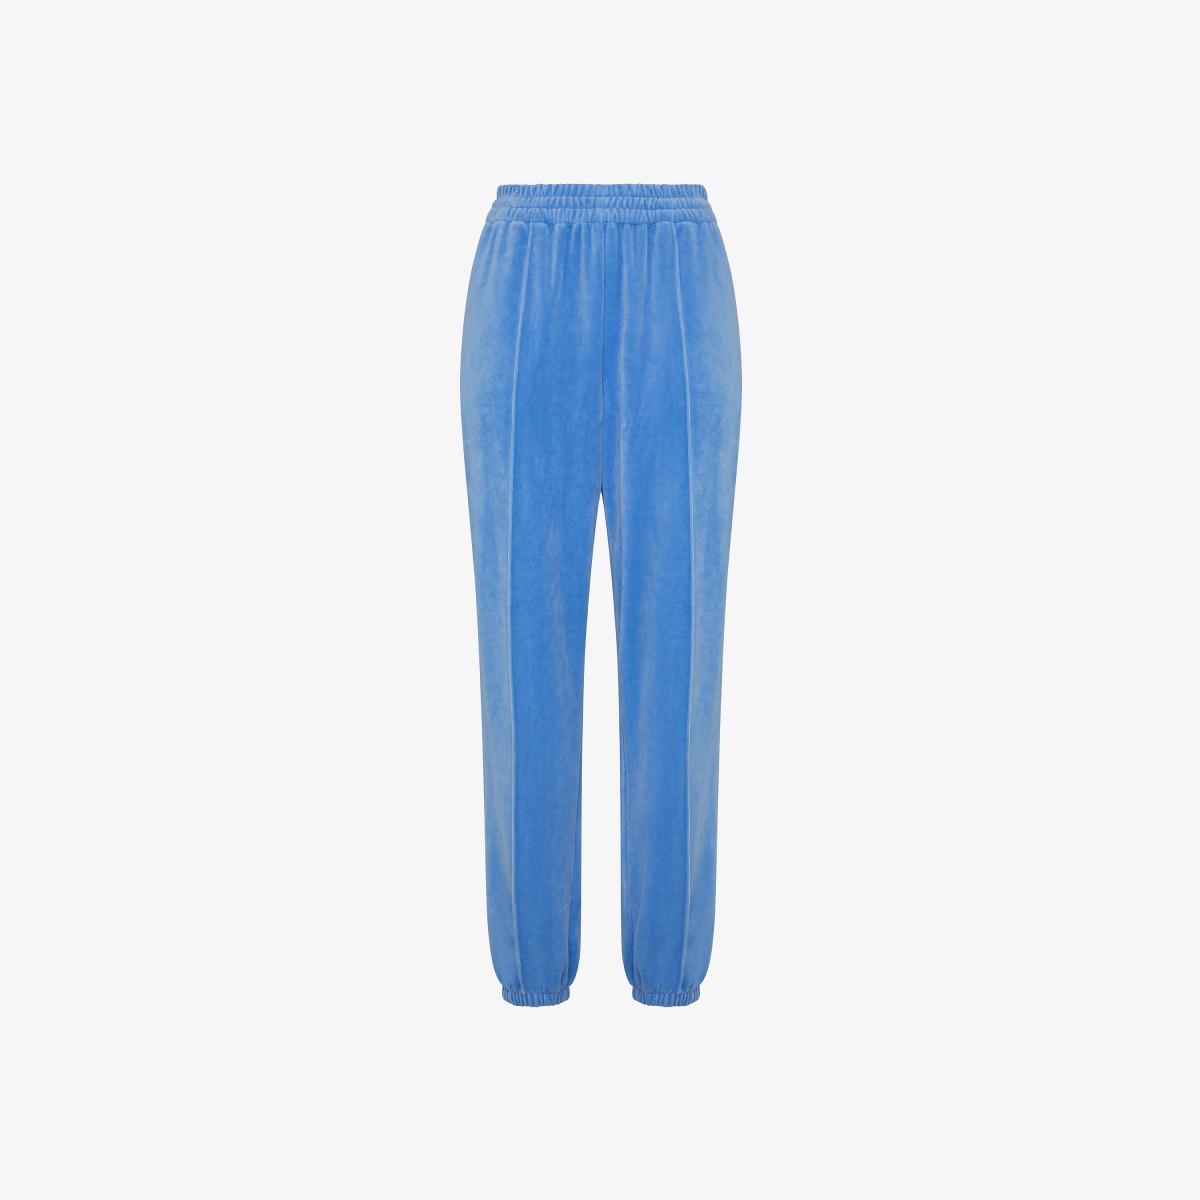 BAGGY PANT CHENILLE BLUE